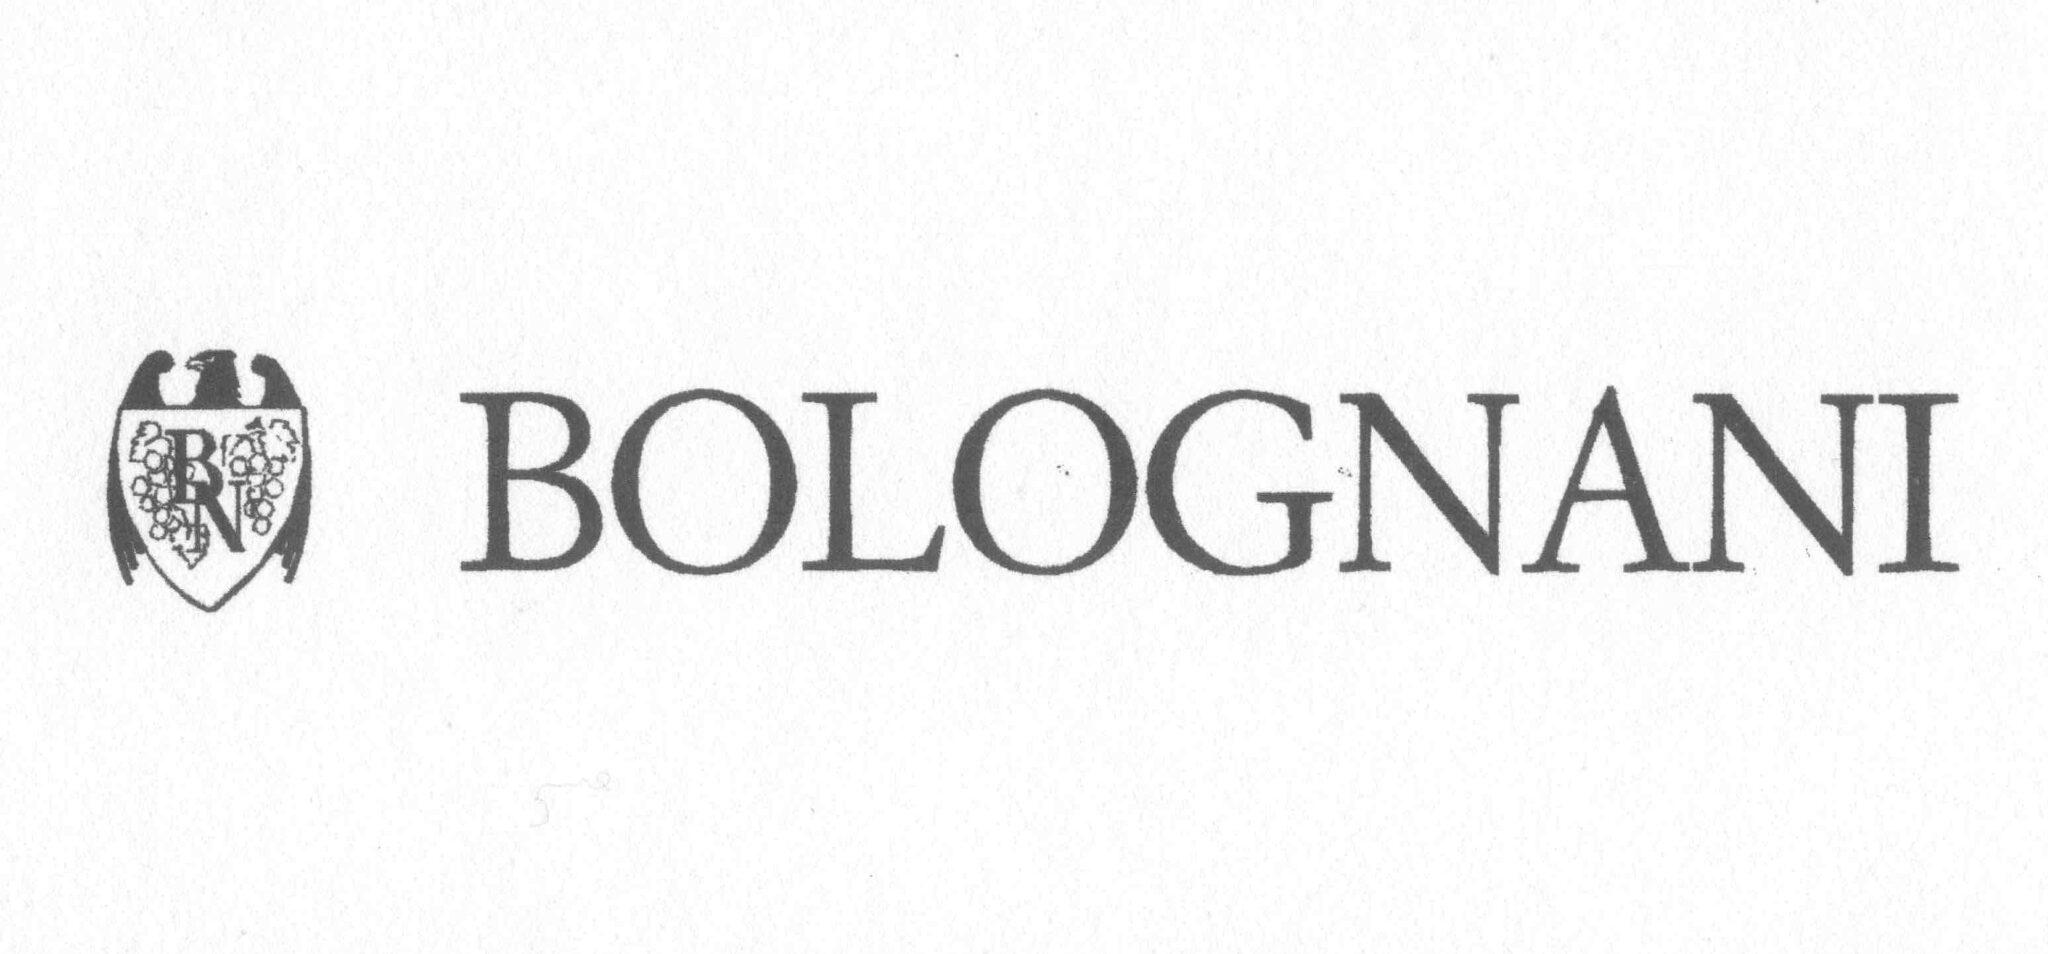 LOGO-BOLOGNANI-VINI